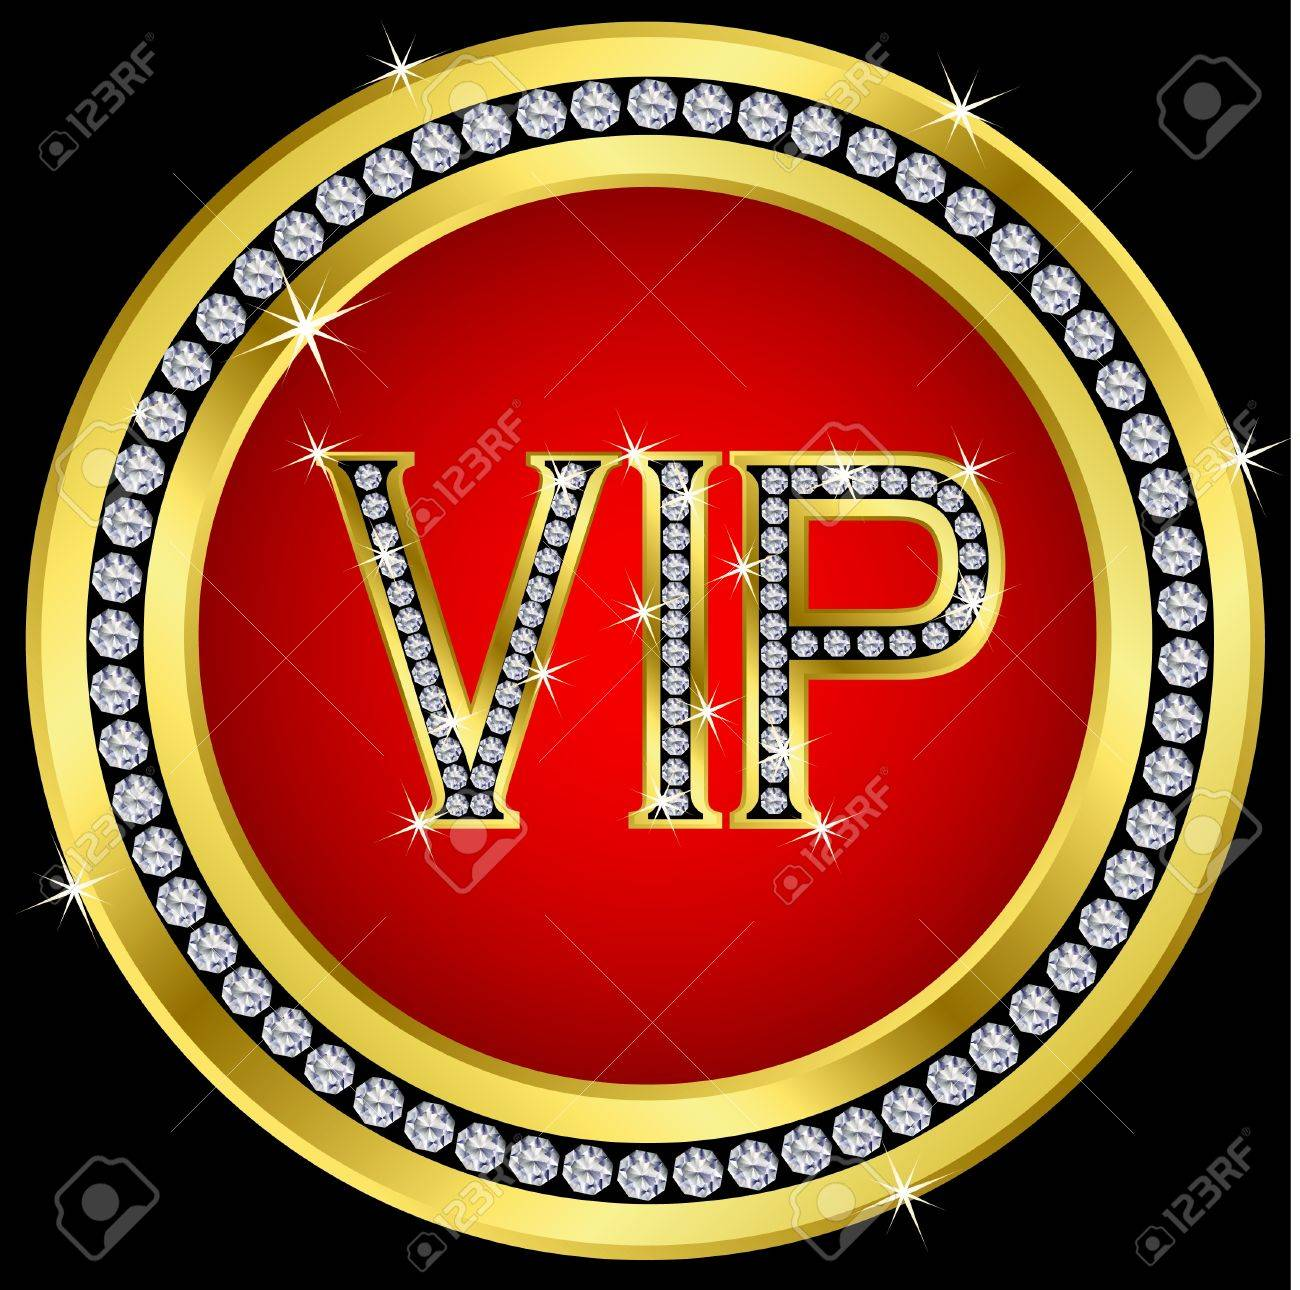 Vip with diamonds, vector Stock Vector - 11657357